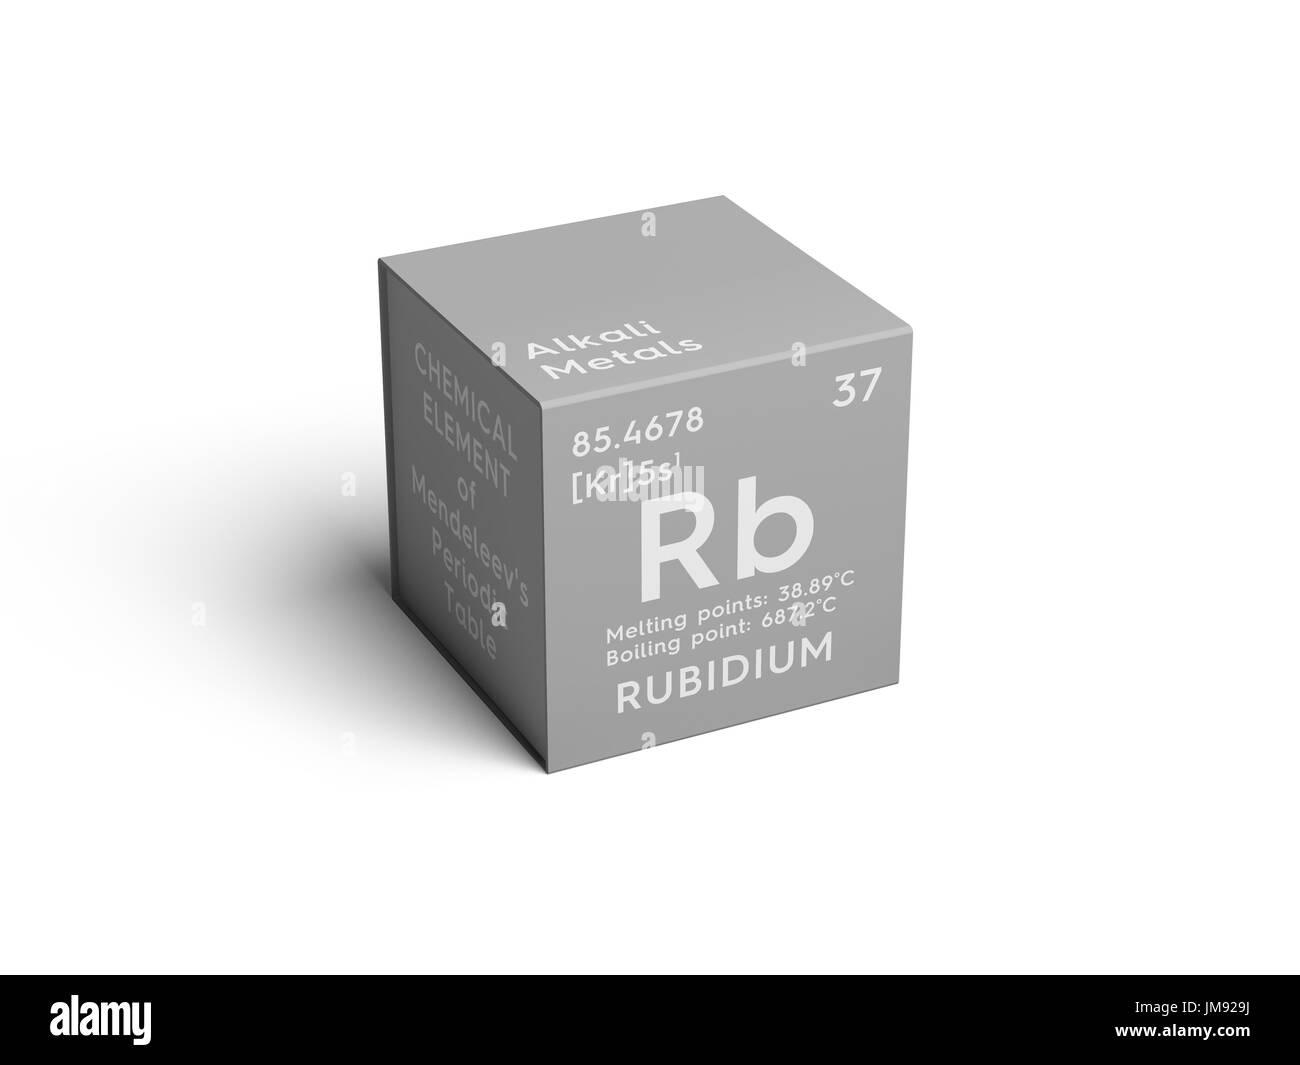 Rubidium alkali metals chemical element of mendeleevs periodic alkali metals chemical element of mendeleevs periodic table rubidium in square cube creative concept urtaz Choice Image